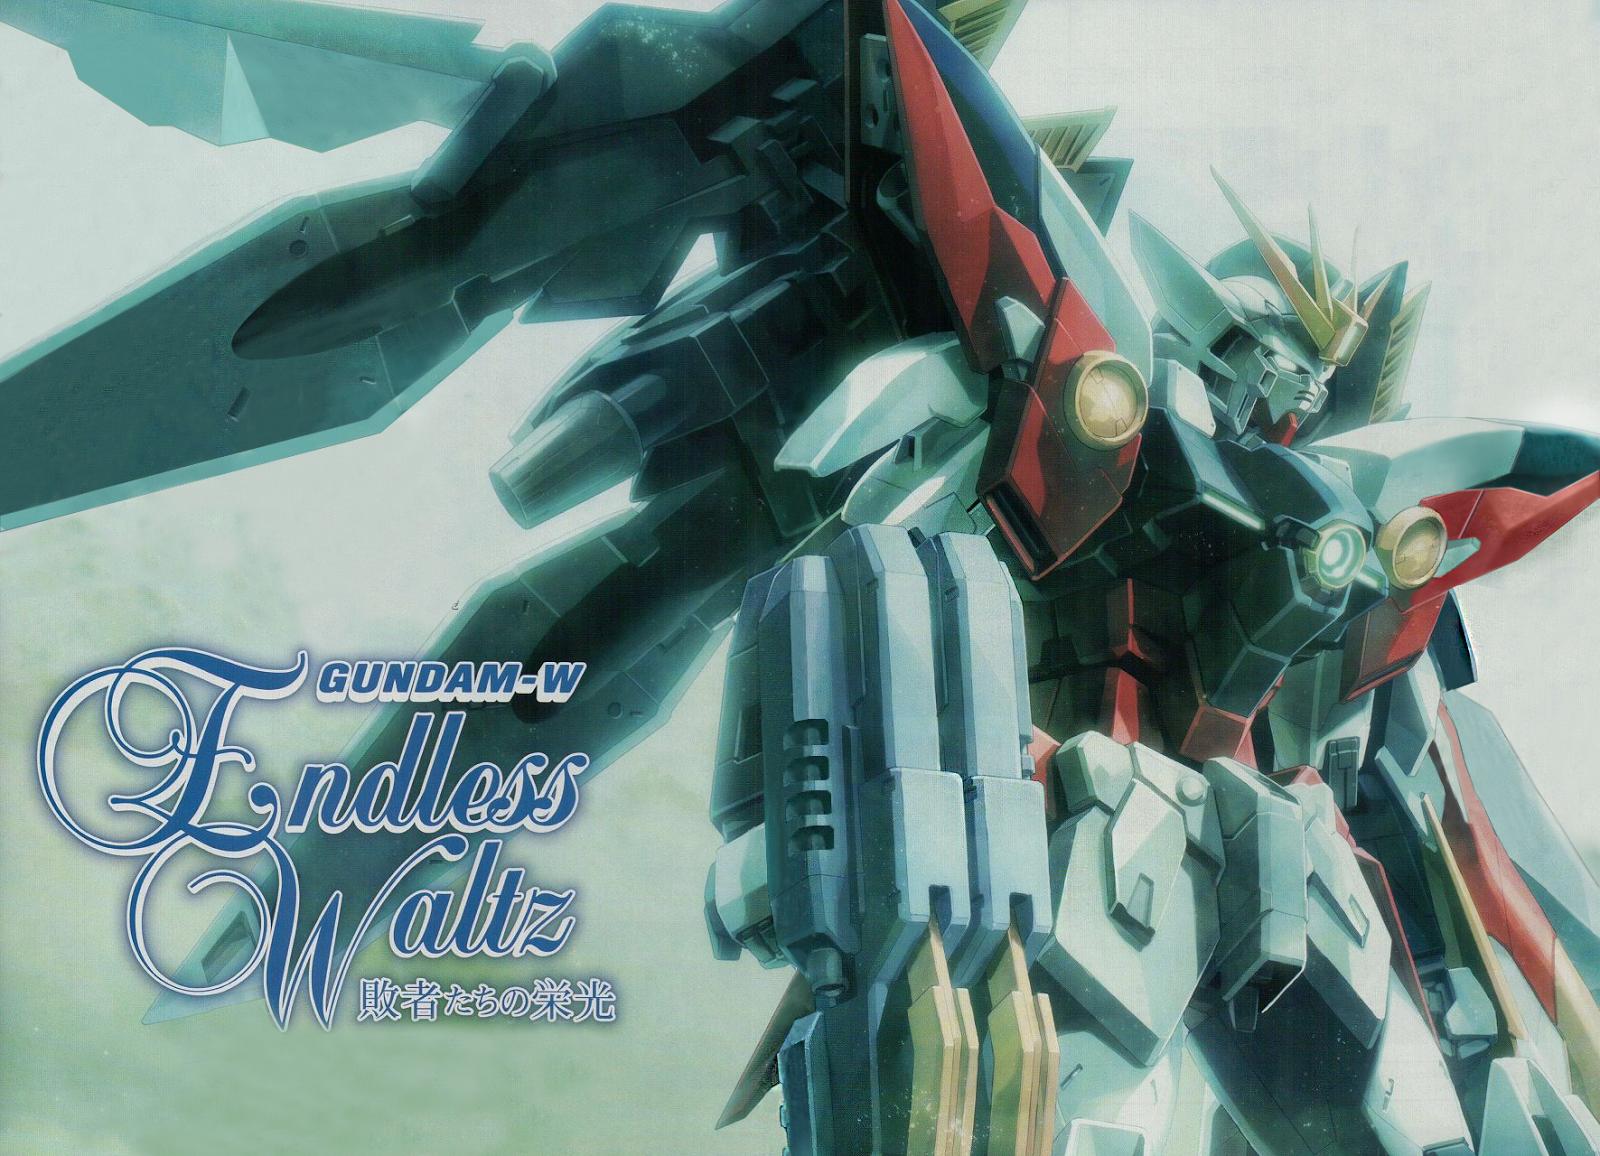 Gundam Wing Endless Waltz Anime Movie Classics Movie HD free download 720p